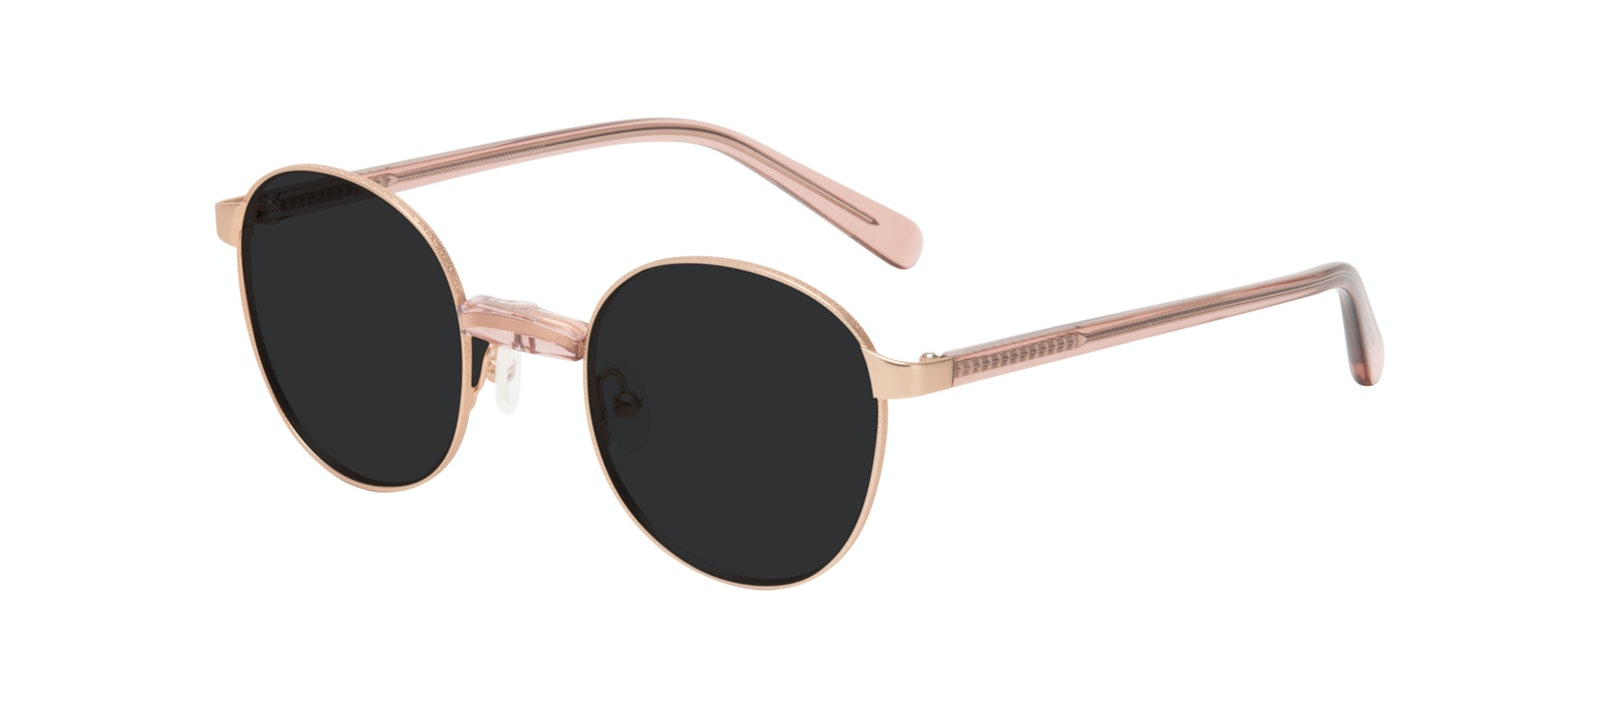 Affordable Fashion Glasses Round Sunglasses Women Curious Rose Tilt